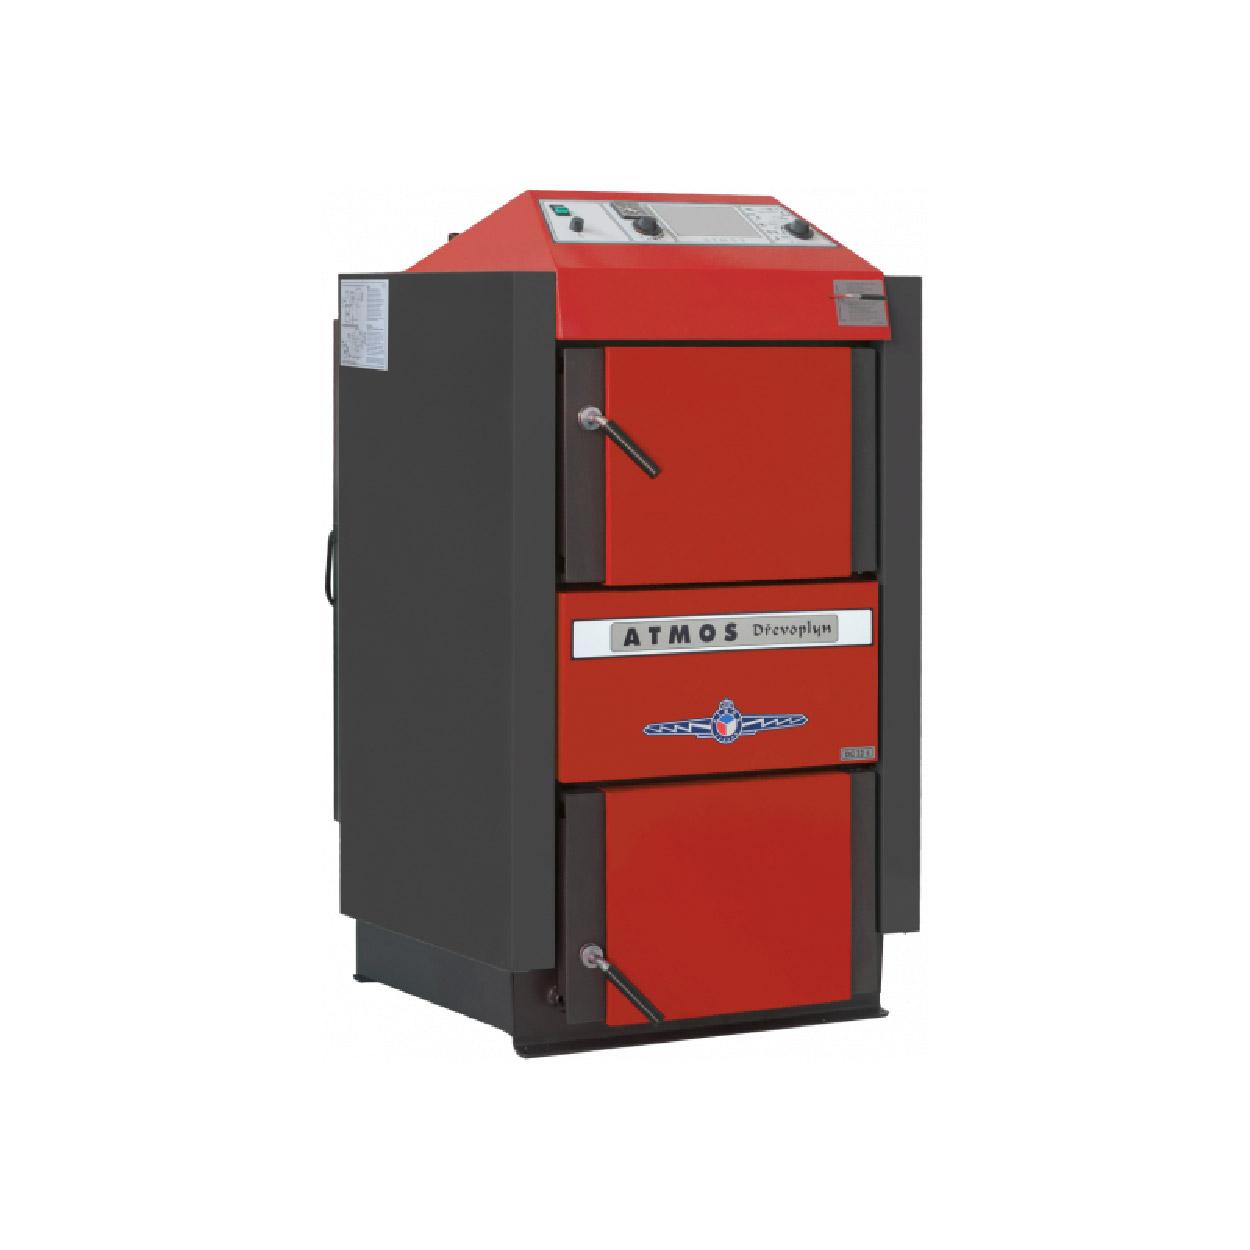 Centrala termica pe lemne ATMOS DC40GS 40 kW fornello imagine